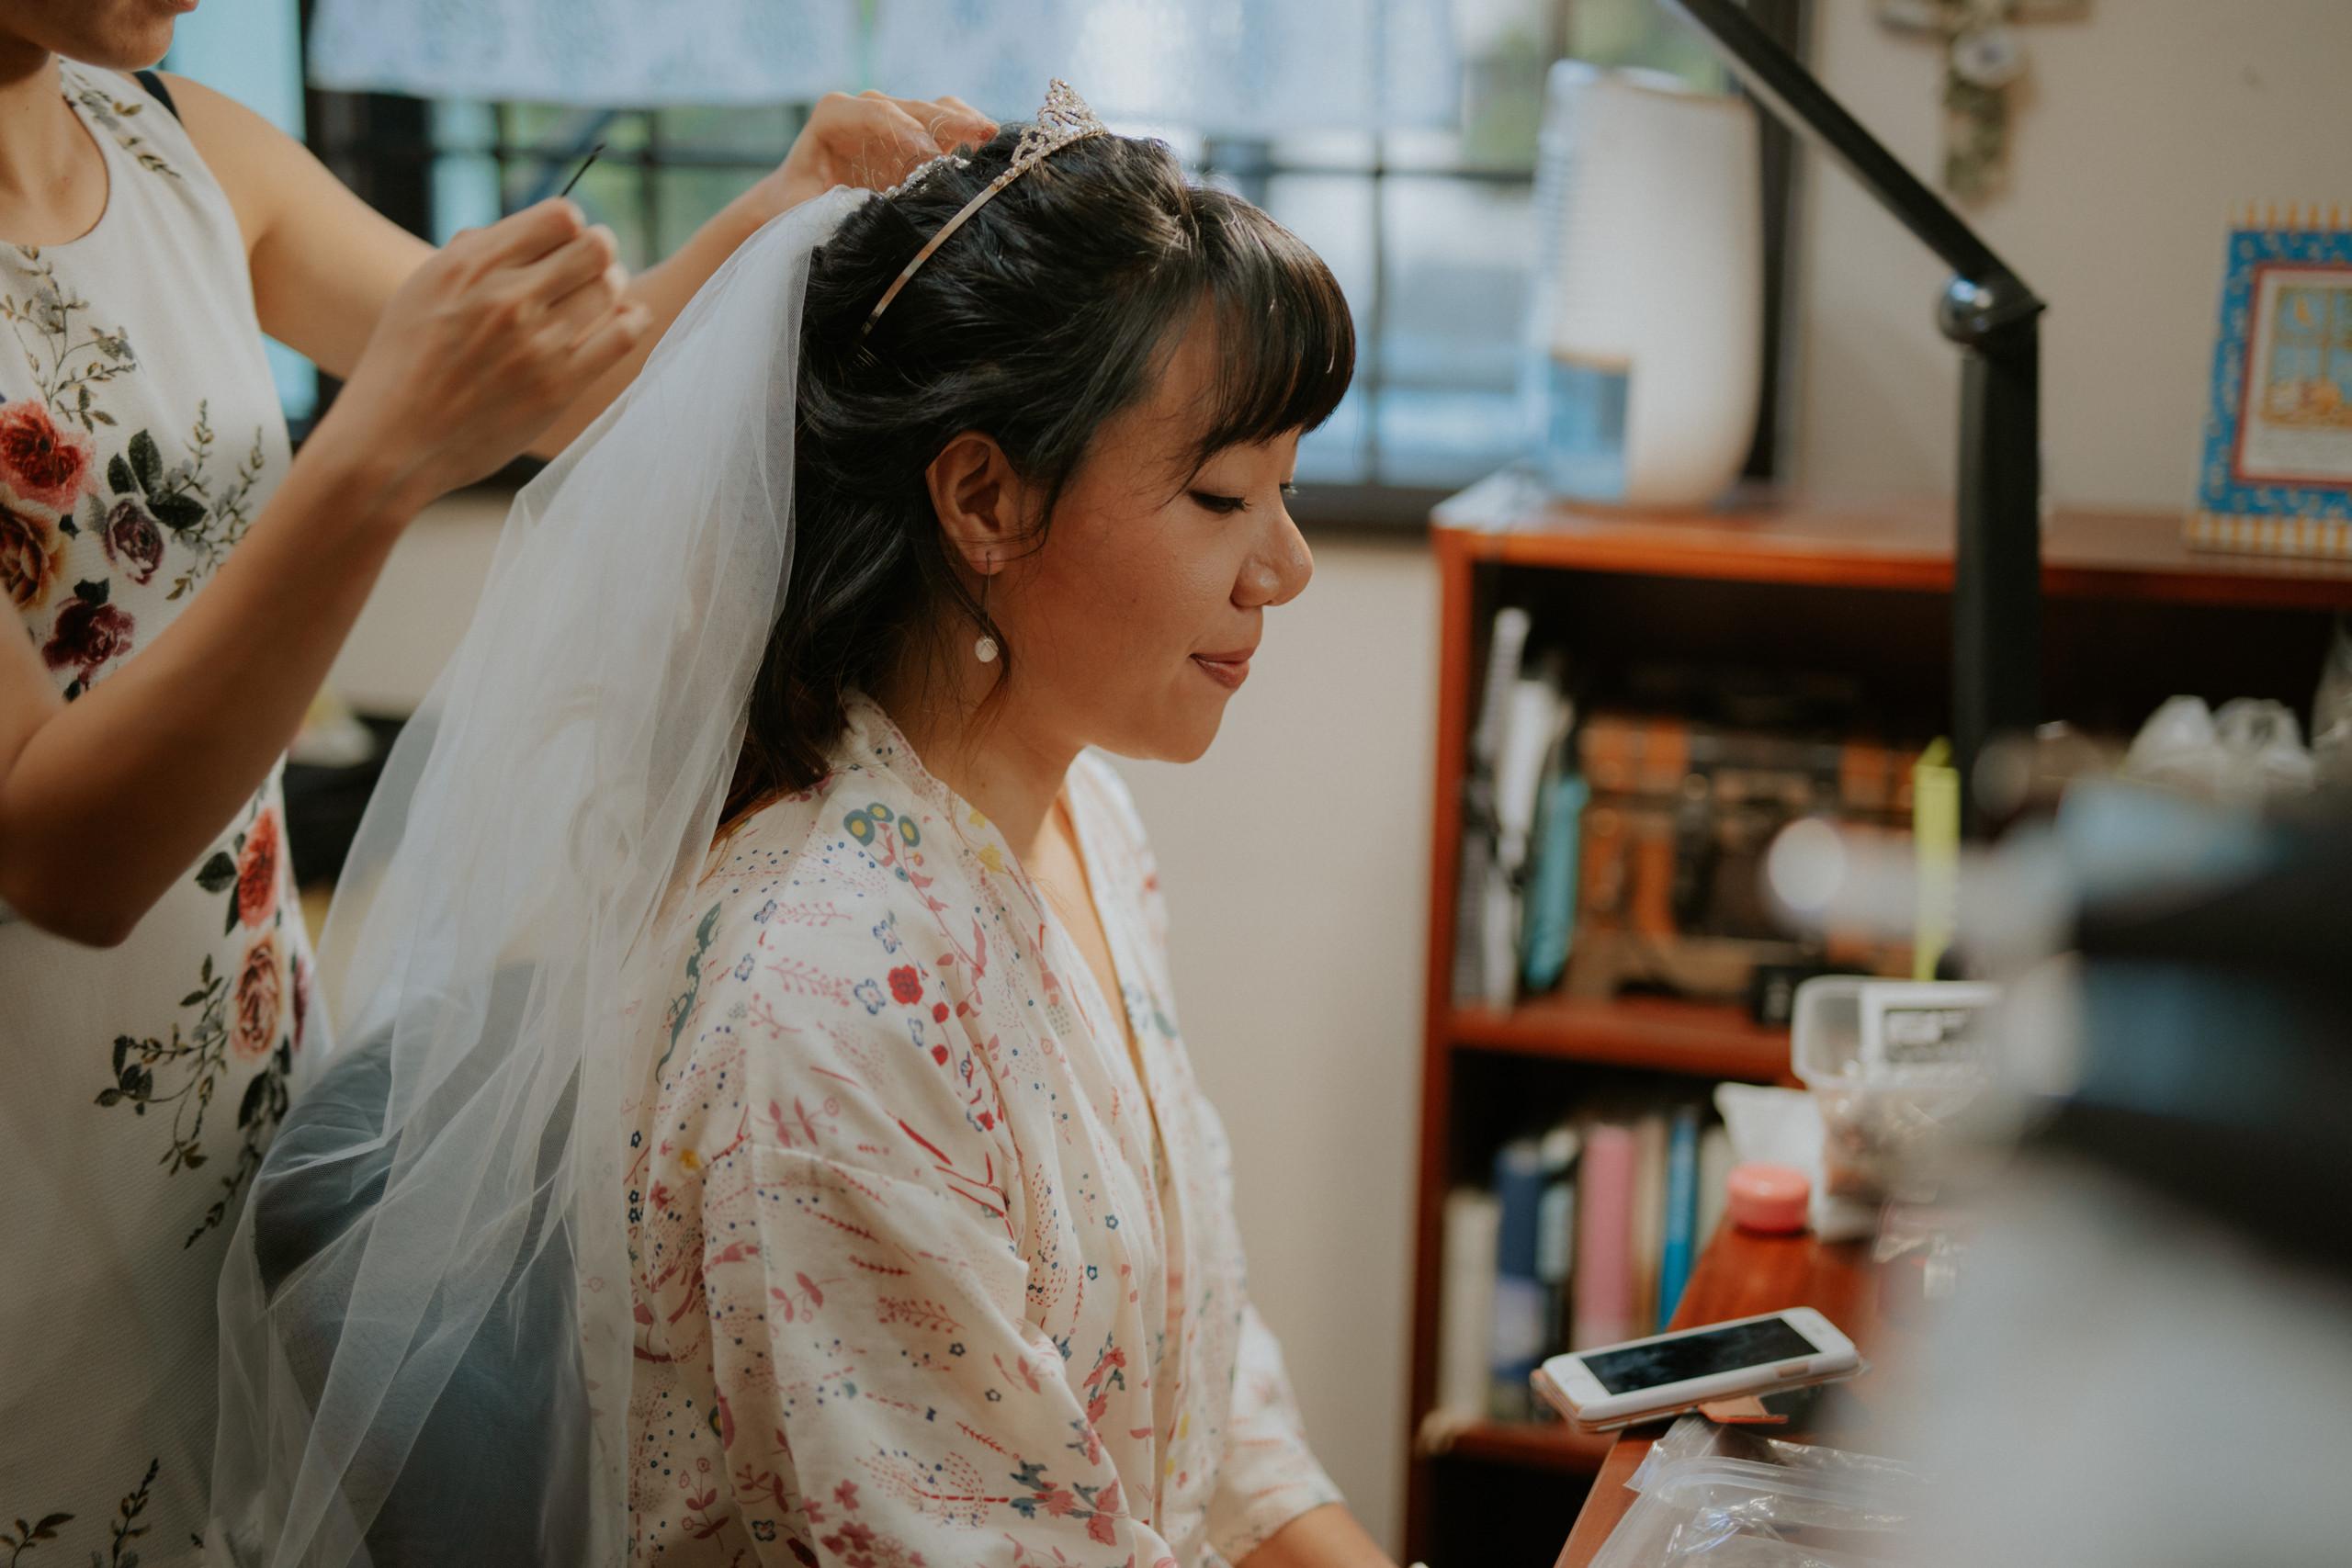 Zealyn looking calm on her wedding day.